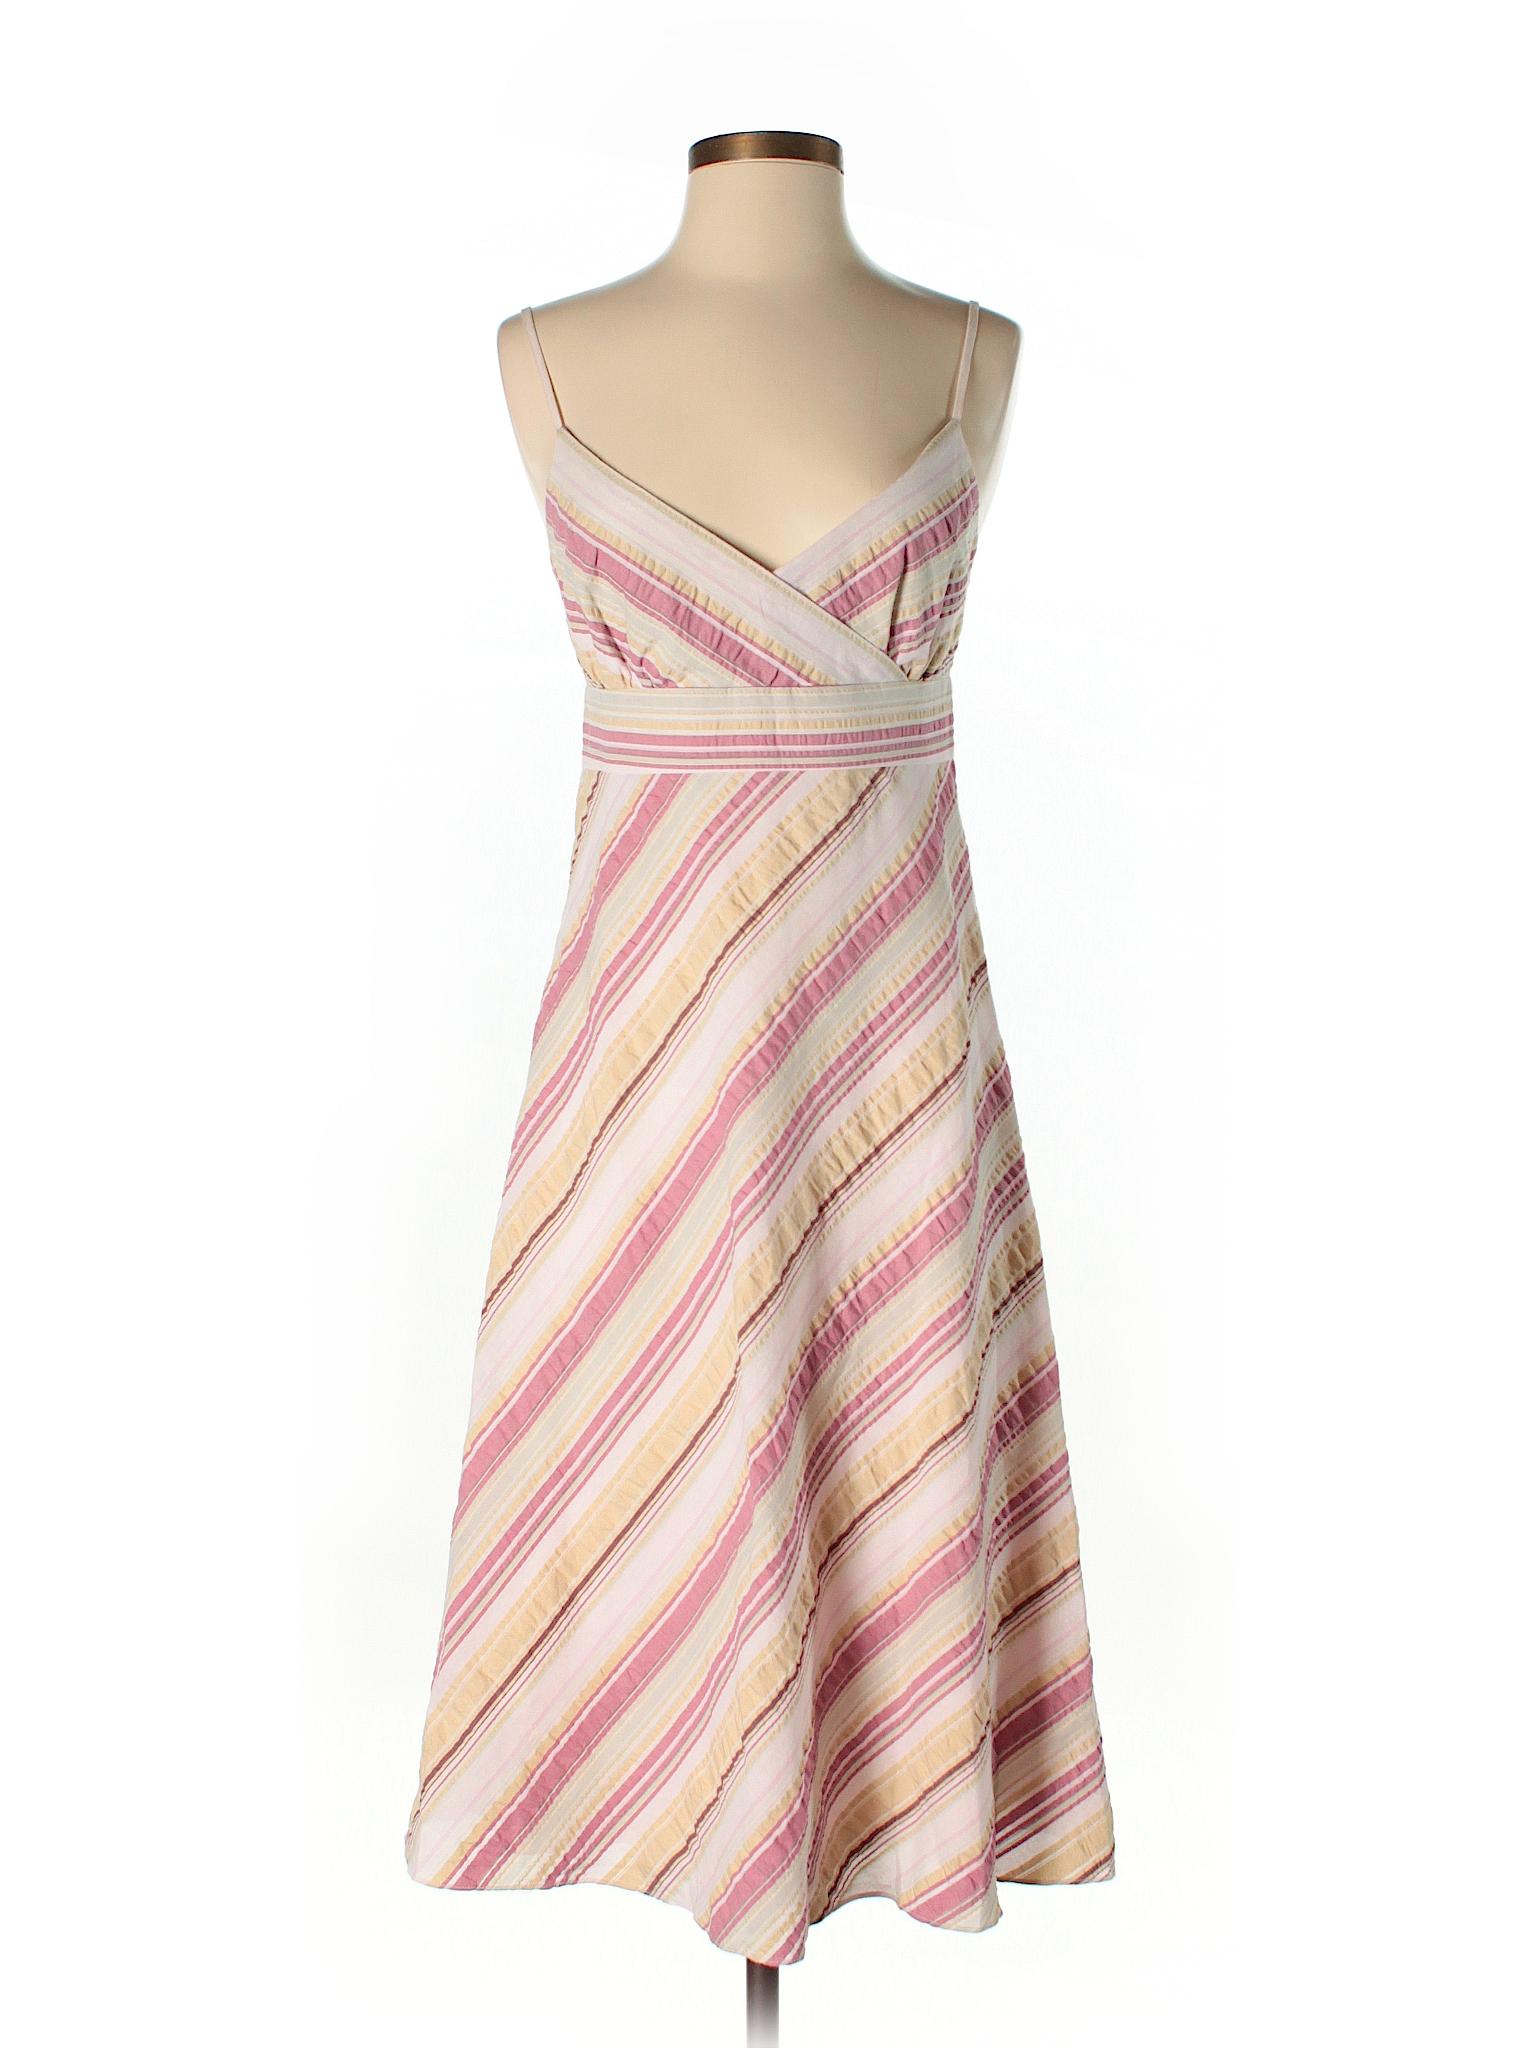 Dress Selling J J Casual Crew Selling rrBUHv